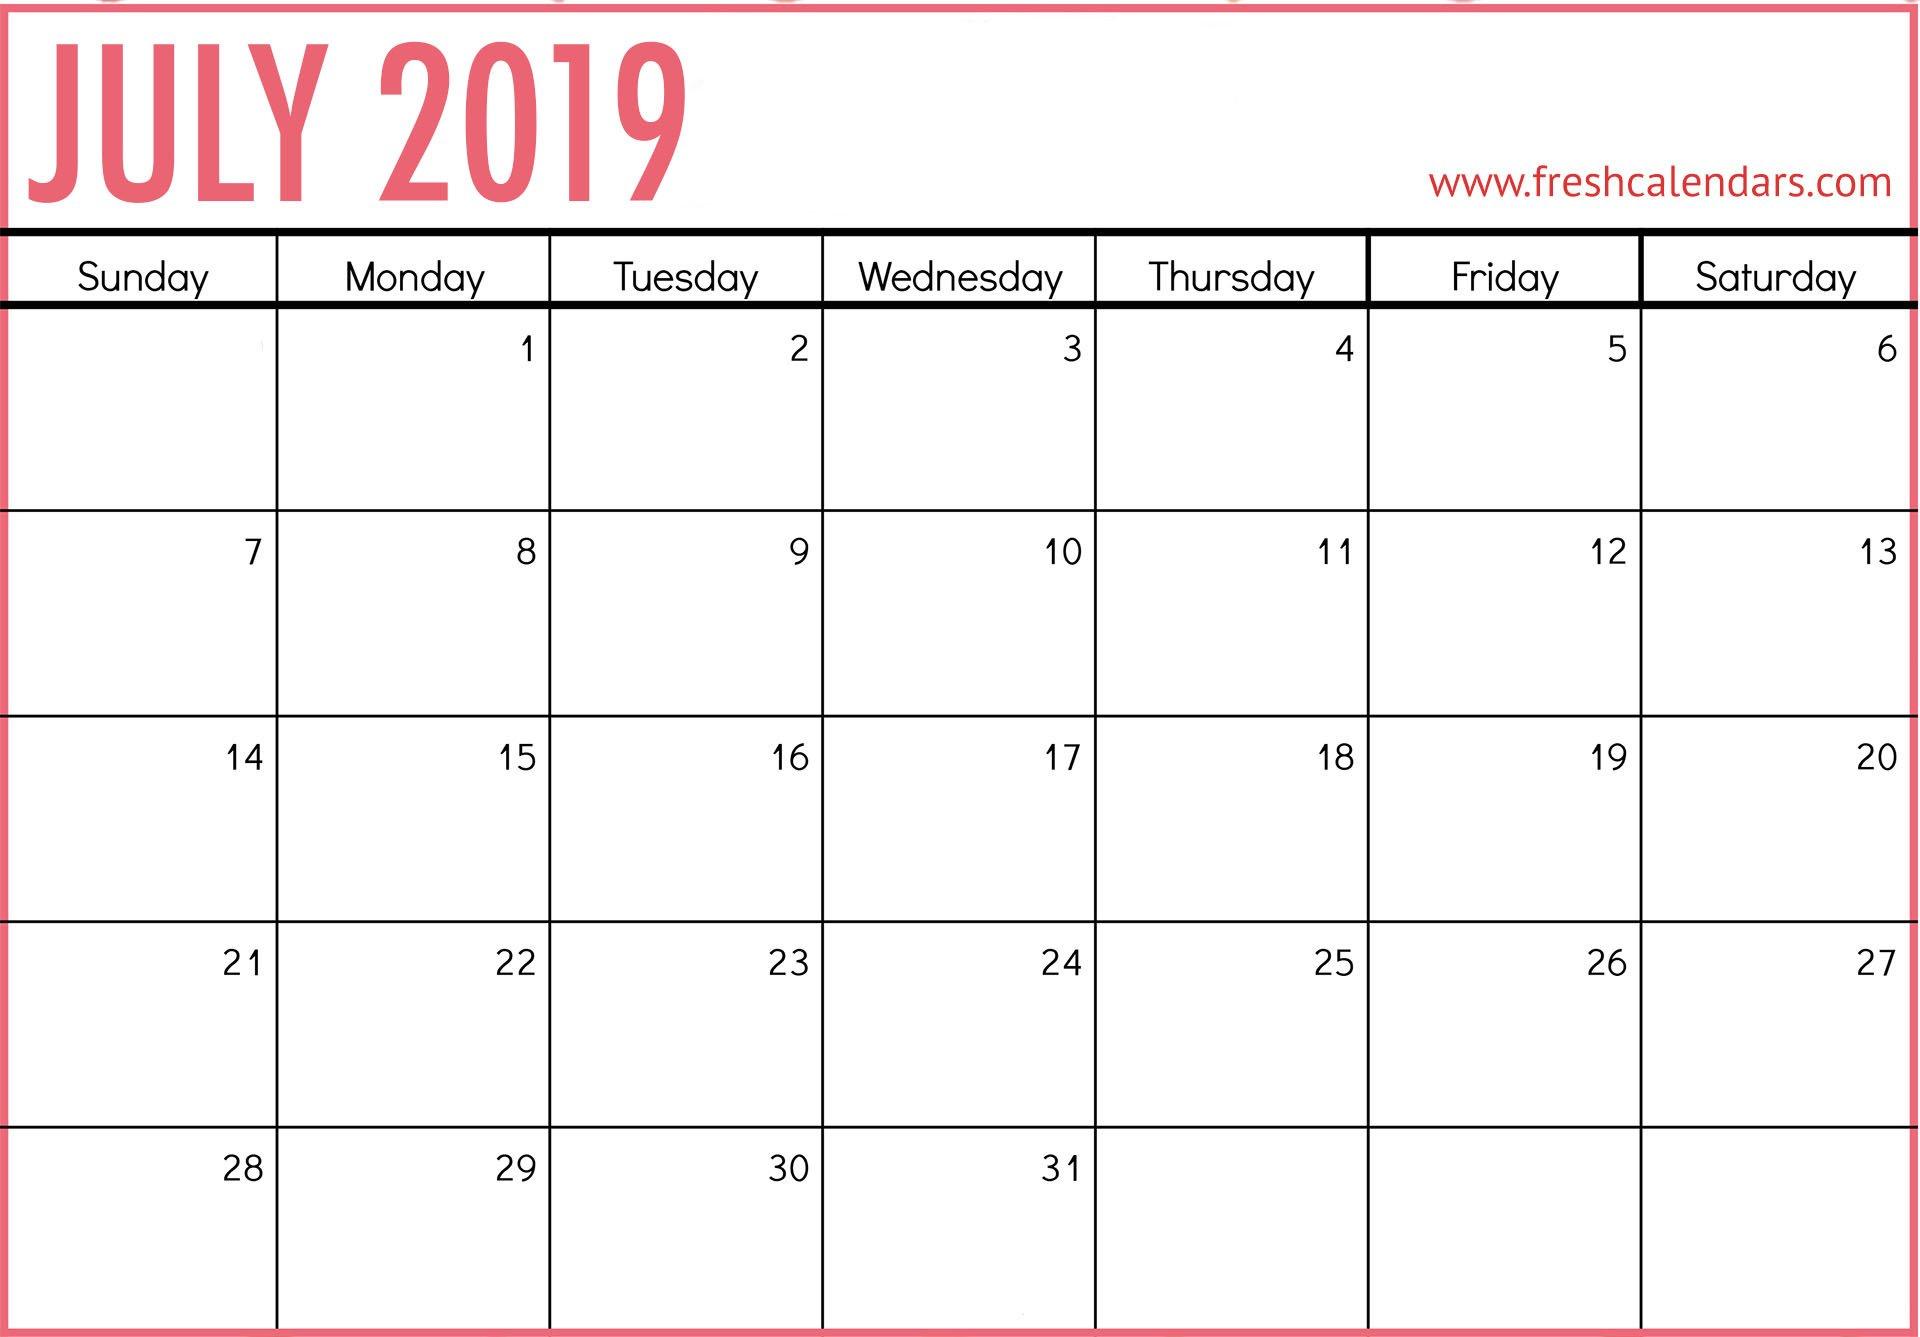 July 2019 Calendar Printable – Fresh Calendars Calendar 2019 July